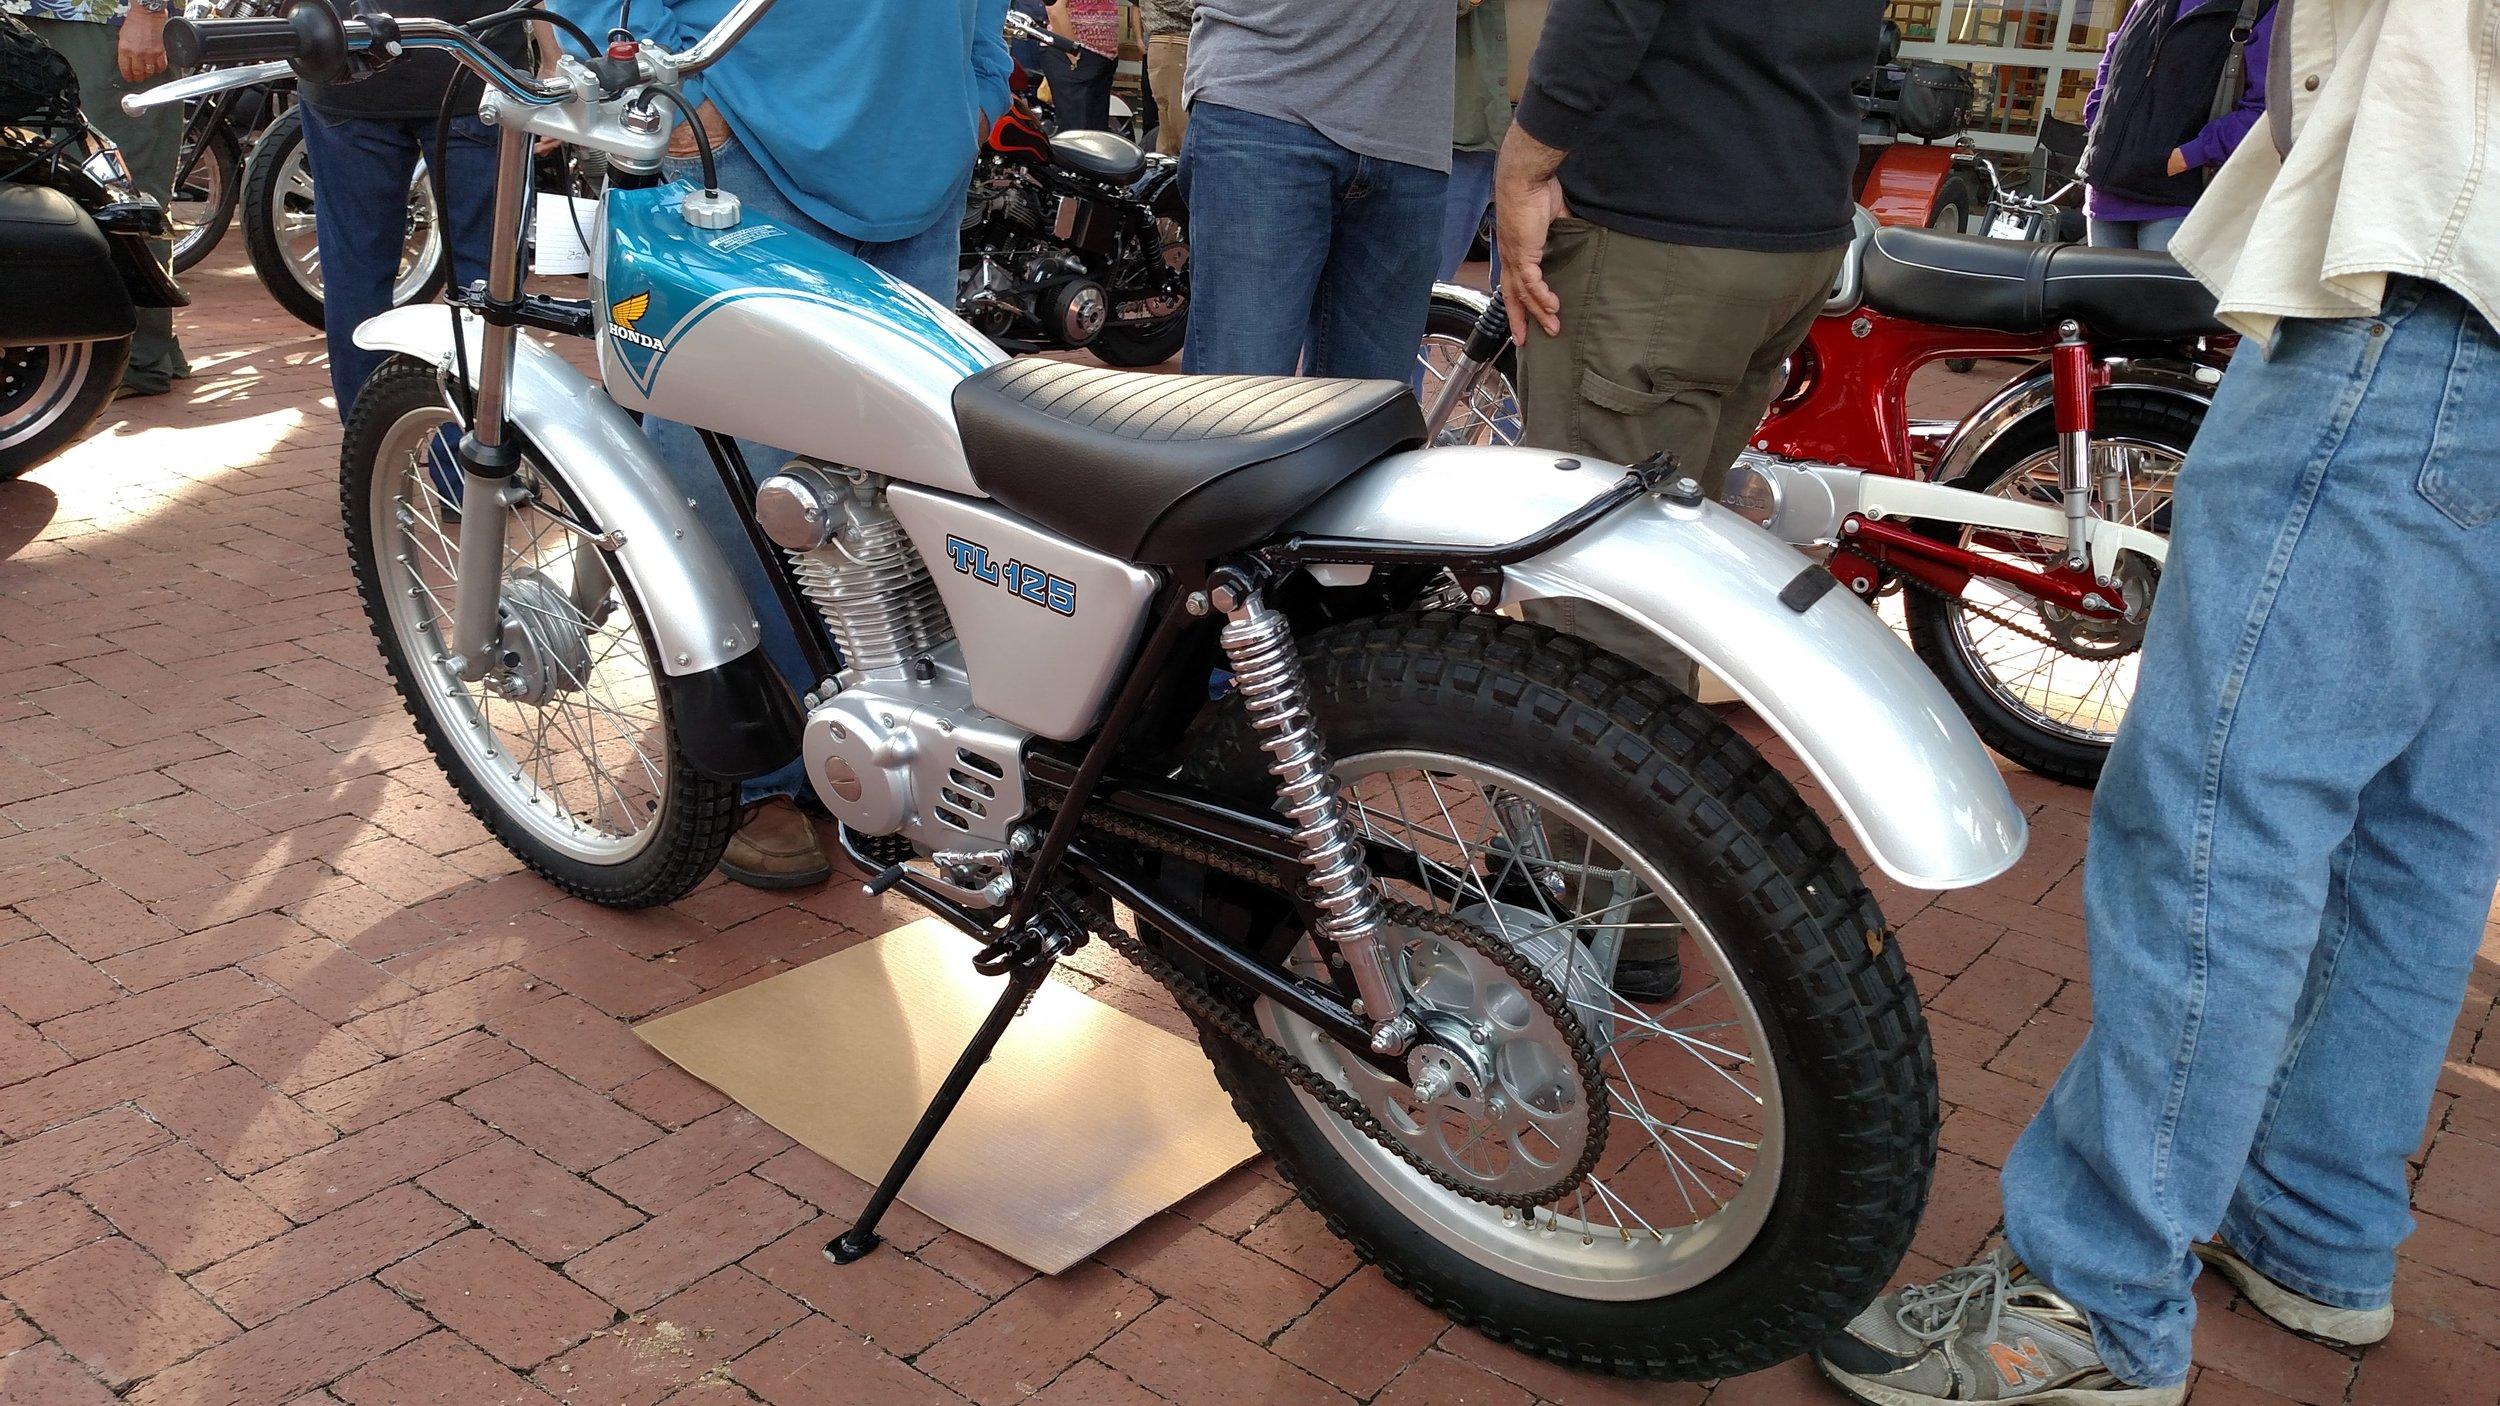 Vintage Japanese - Under 305cc